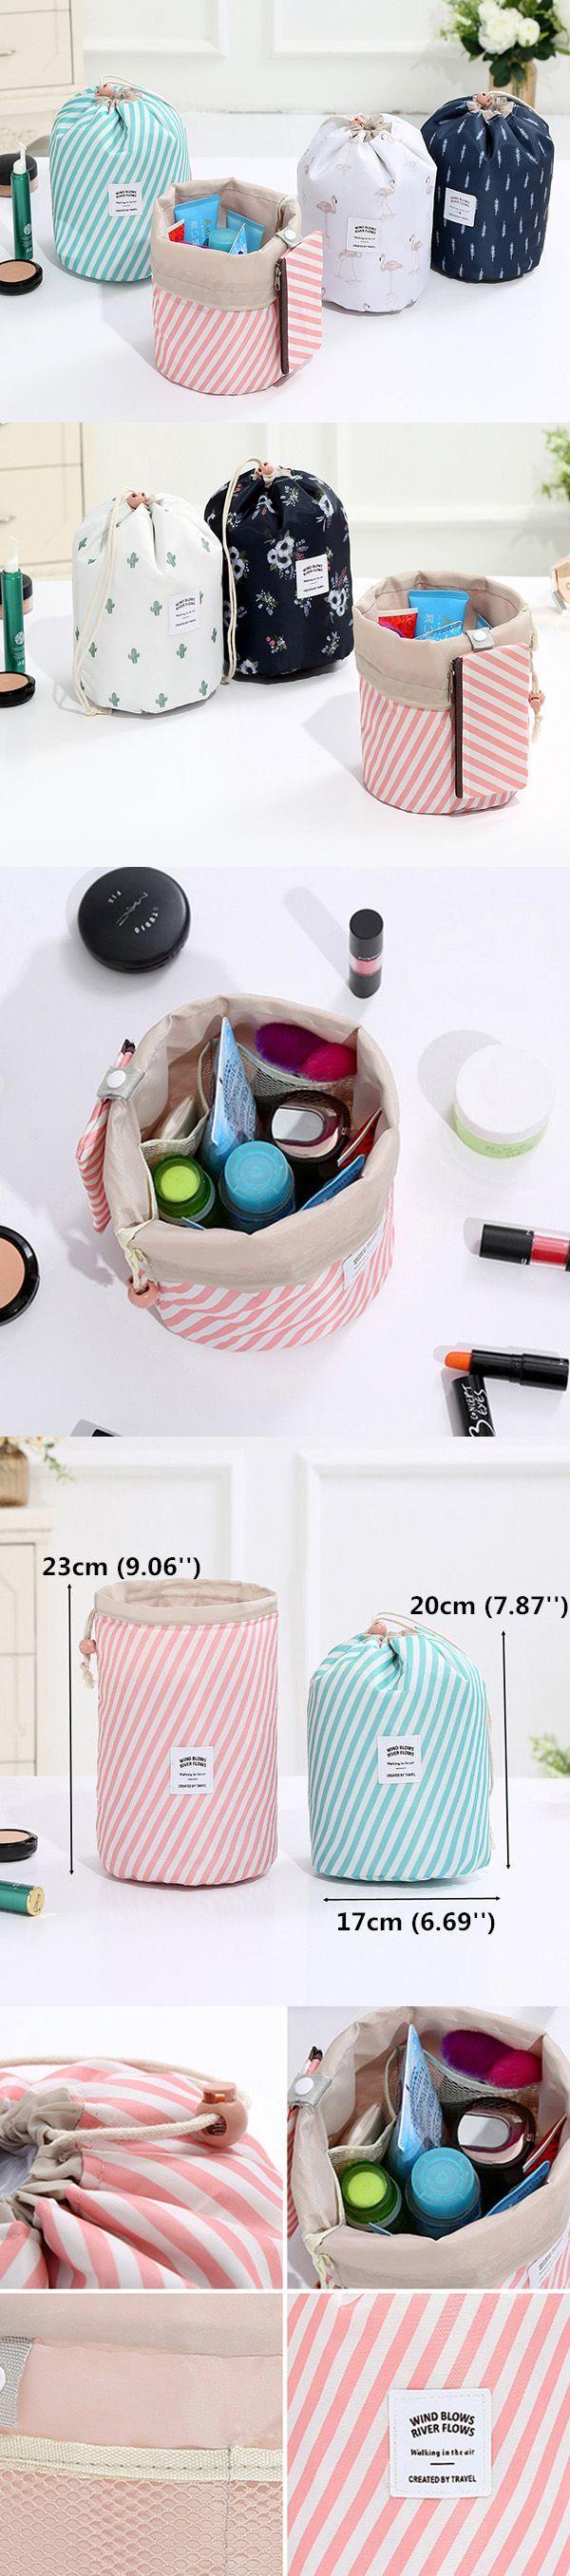 Woman Print Cosmetic Storage Kit Toiletry Kit Bathroom